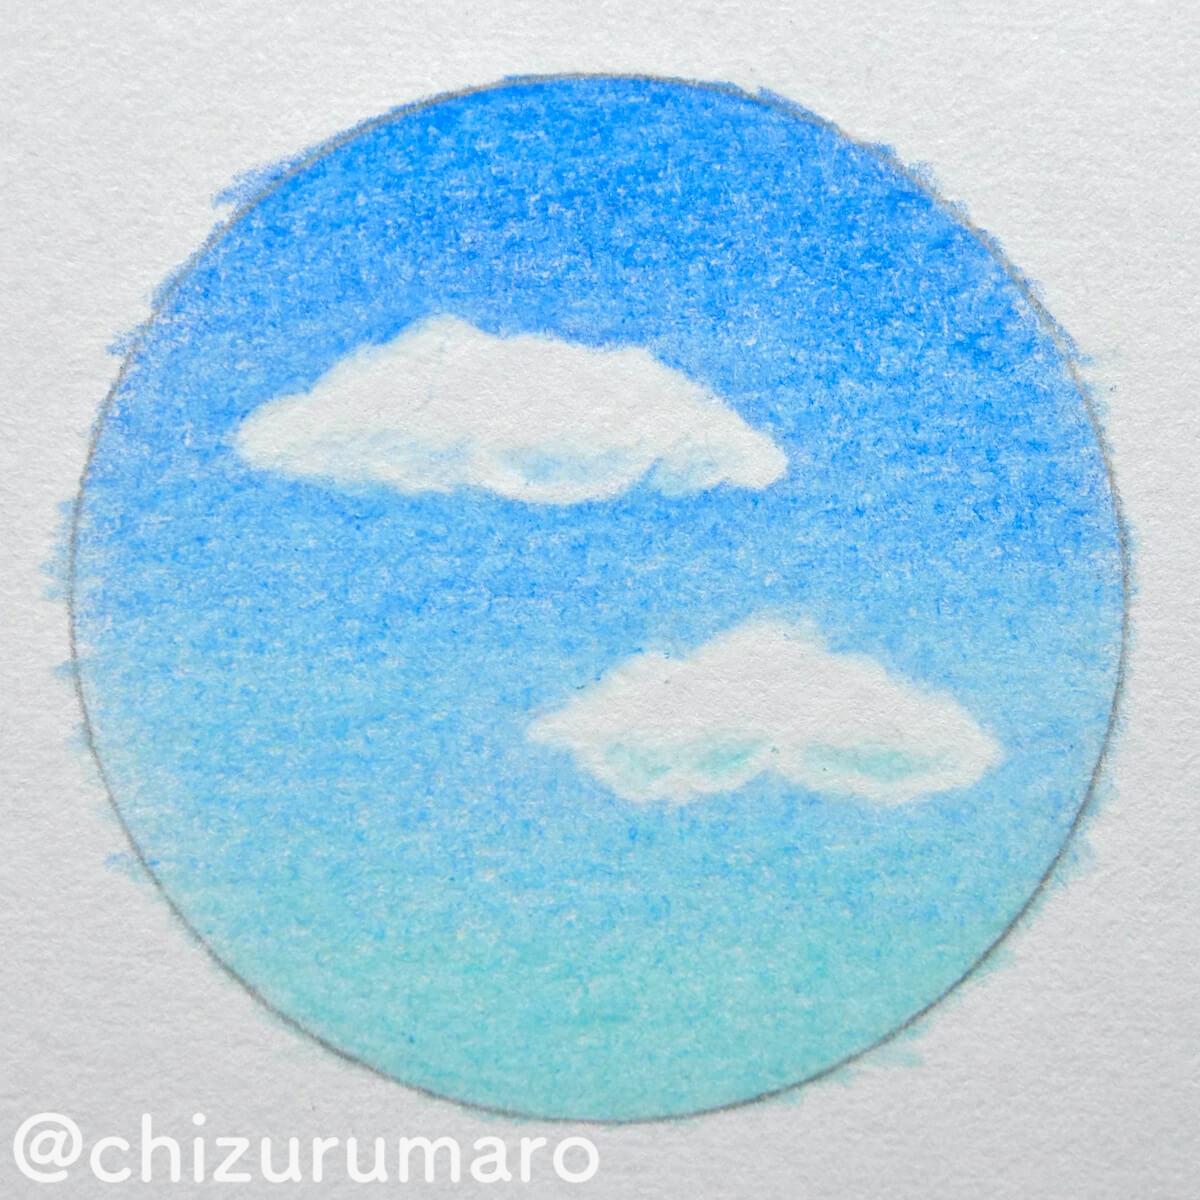 f:id:chizurumaro:20210812224643j:plain